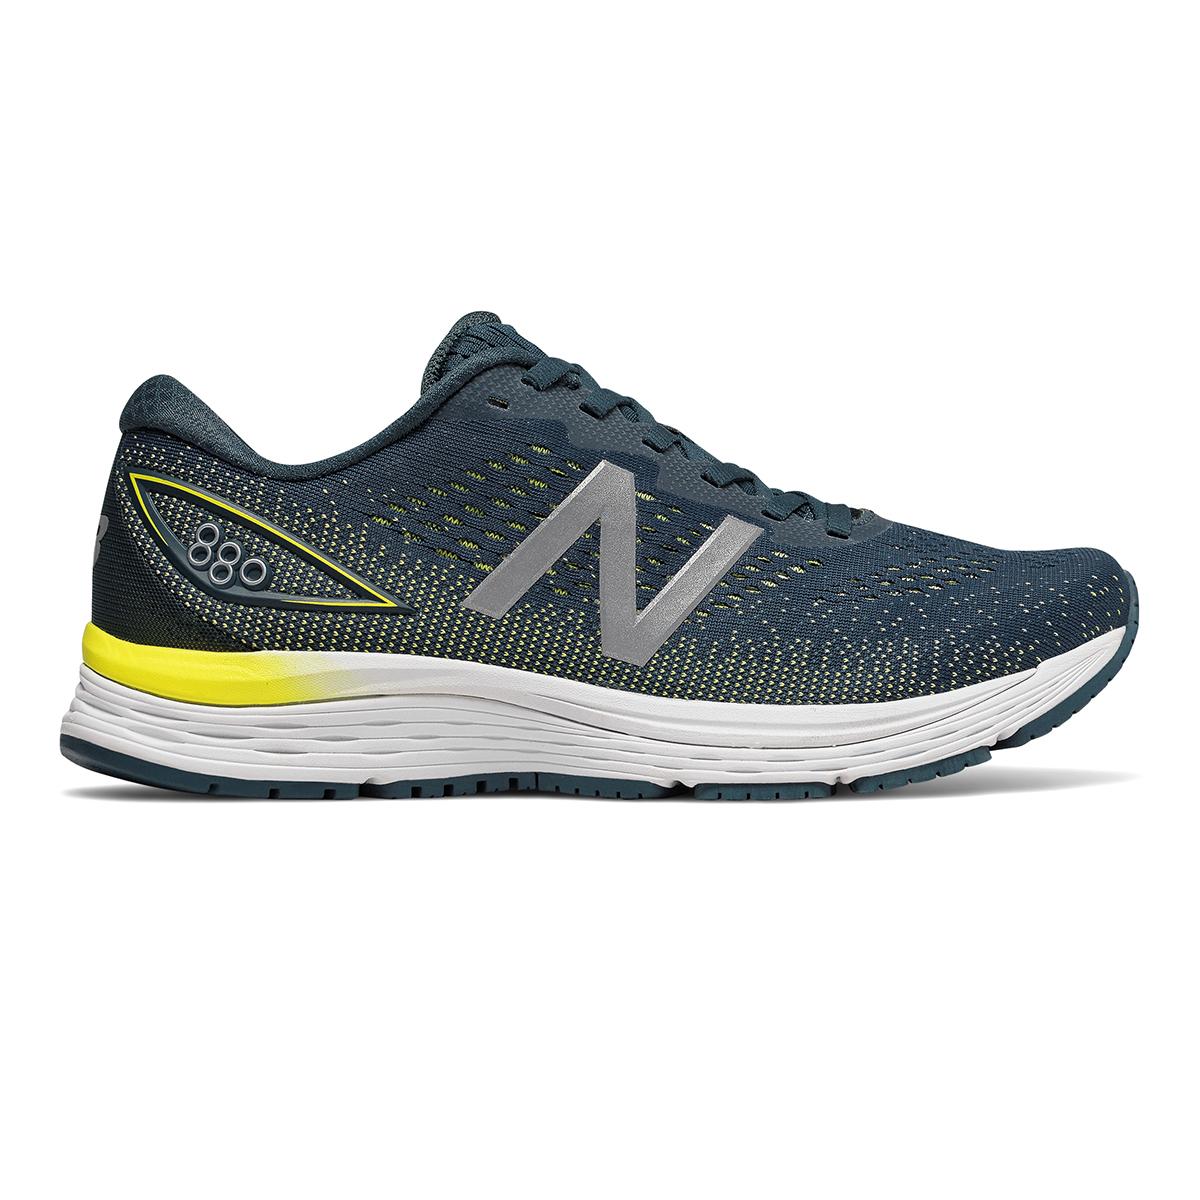 Men's New Balance 880V9 Running Shoe - Color: Supercell / Orion Blue / Sulphur Yellow (Regular Width) - Size: 8.5, Supercell / Orion Blue / Sulphur Yellow, large, image 1